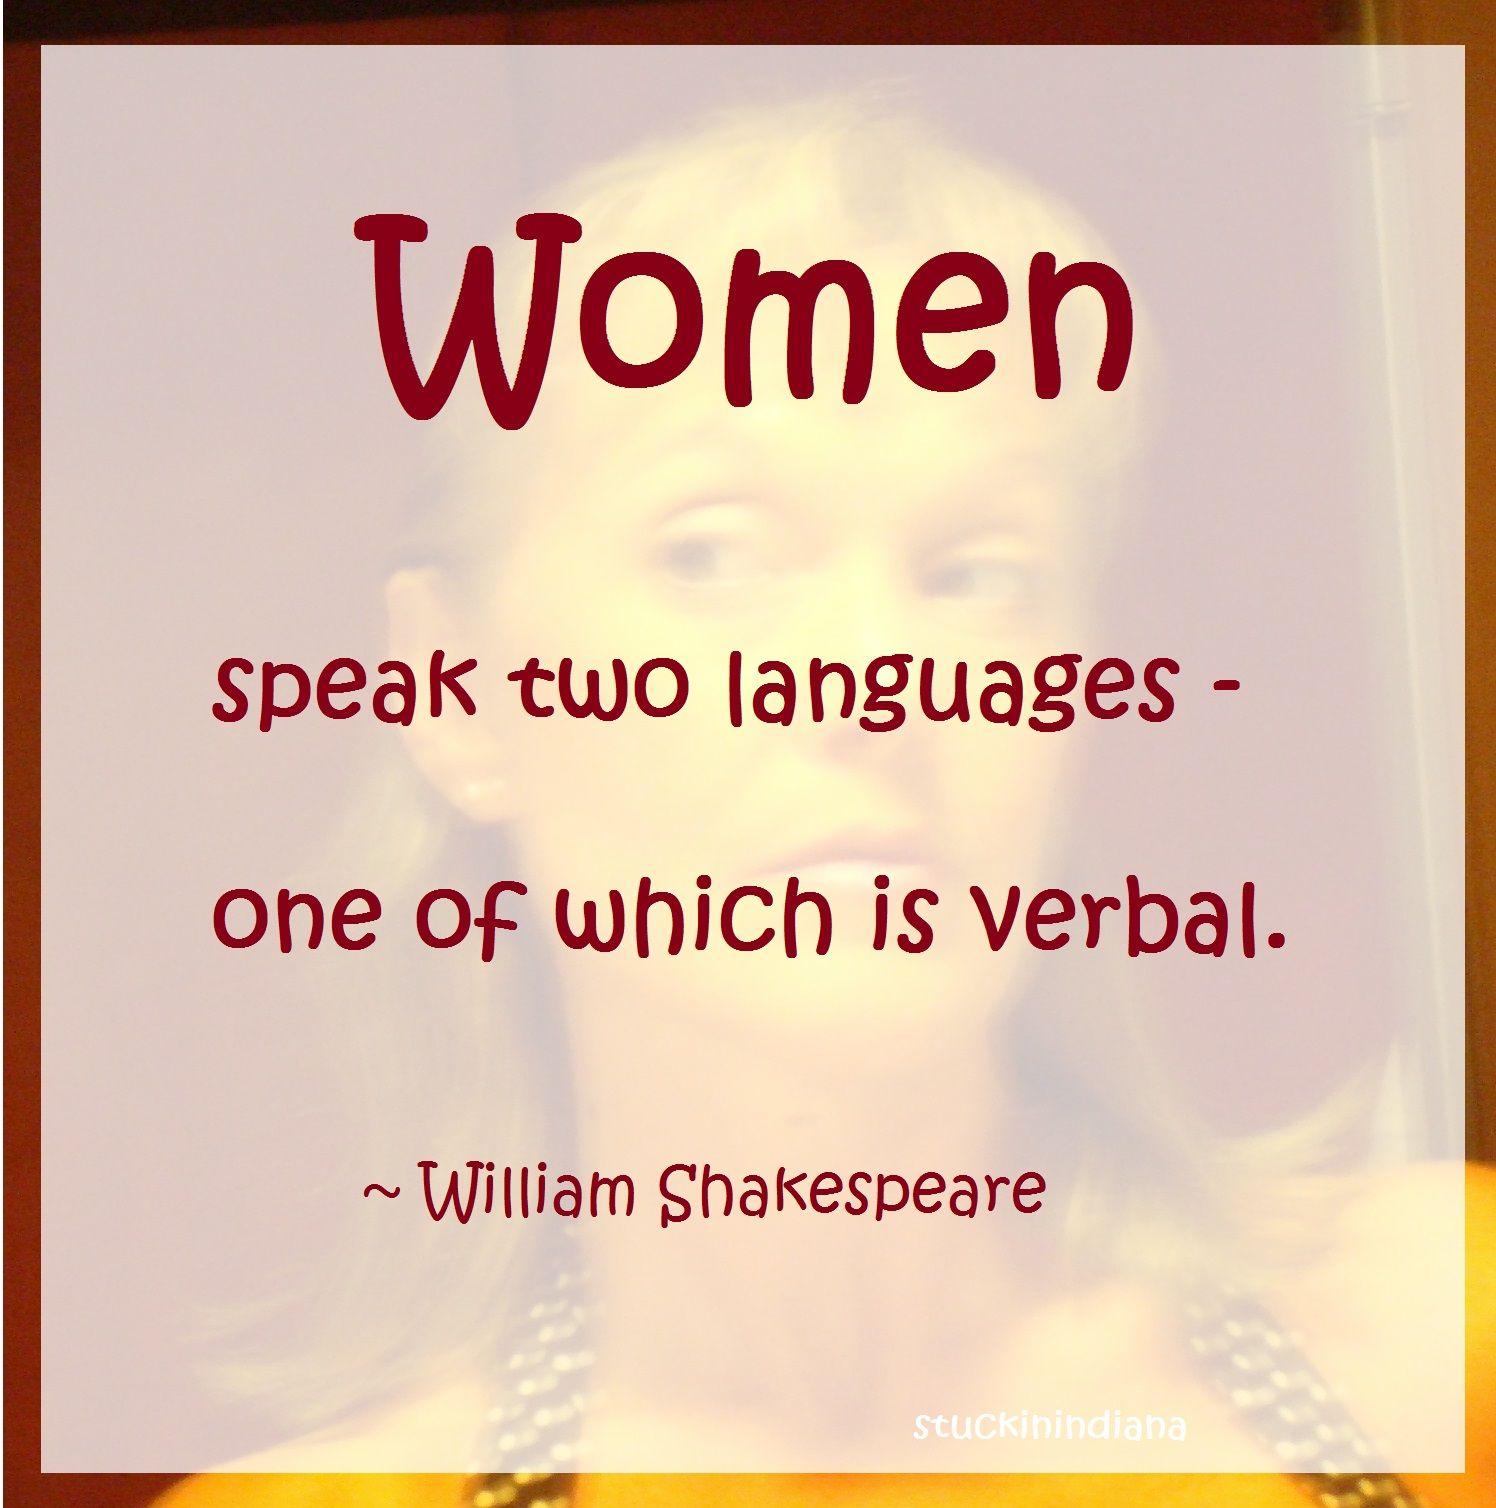 Fyi per shakespeare women speak two languages one